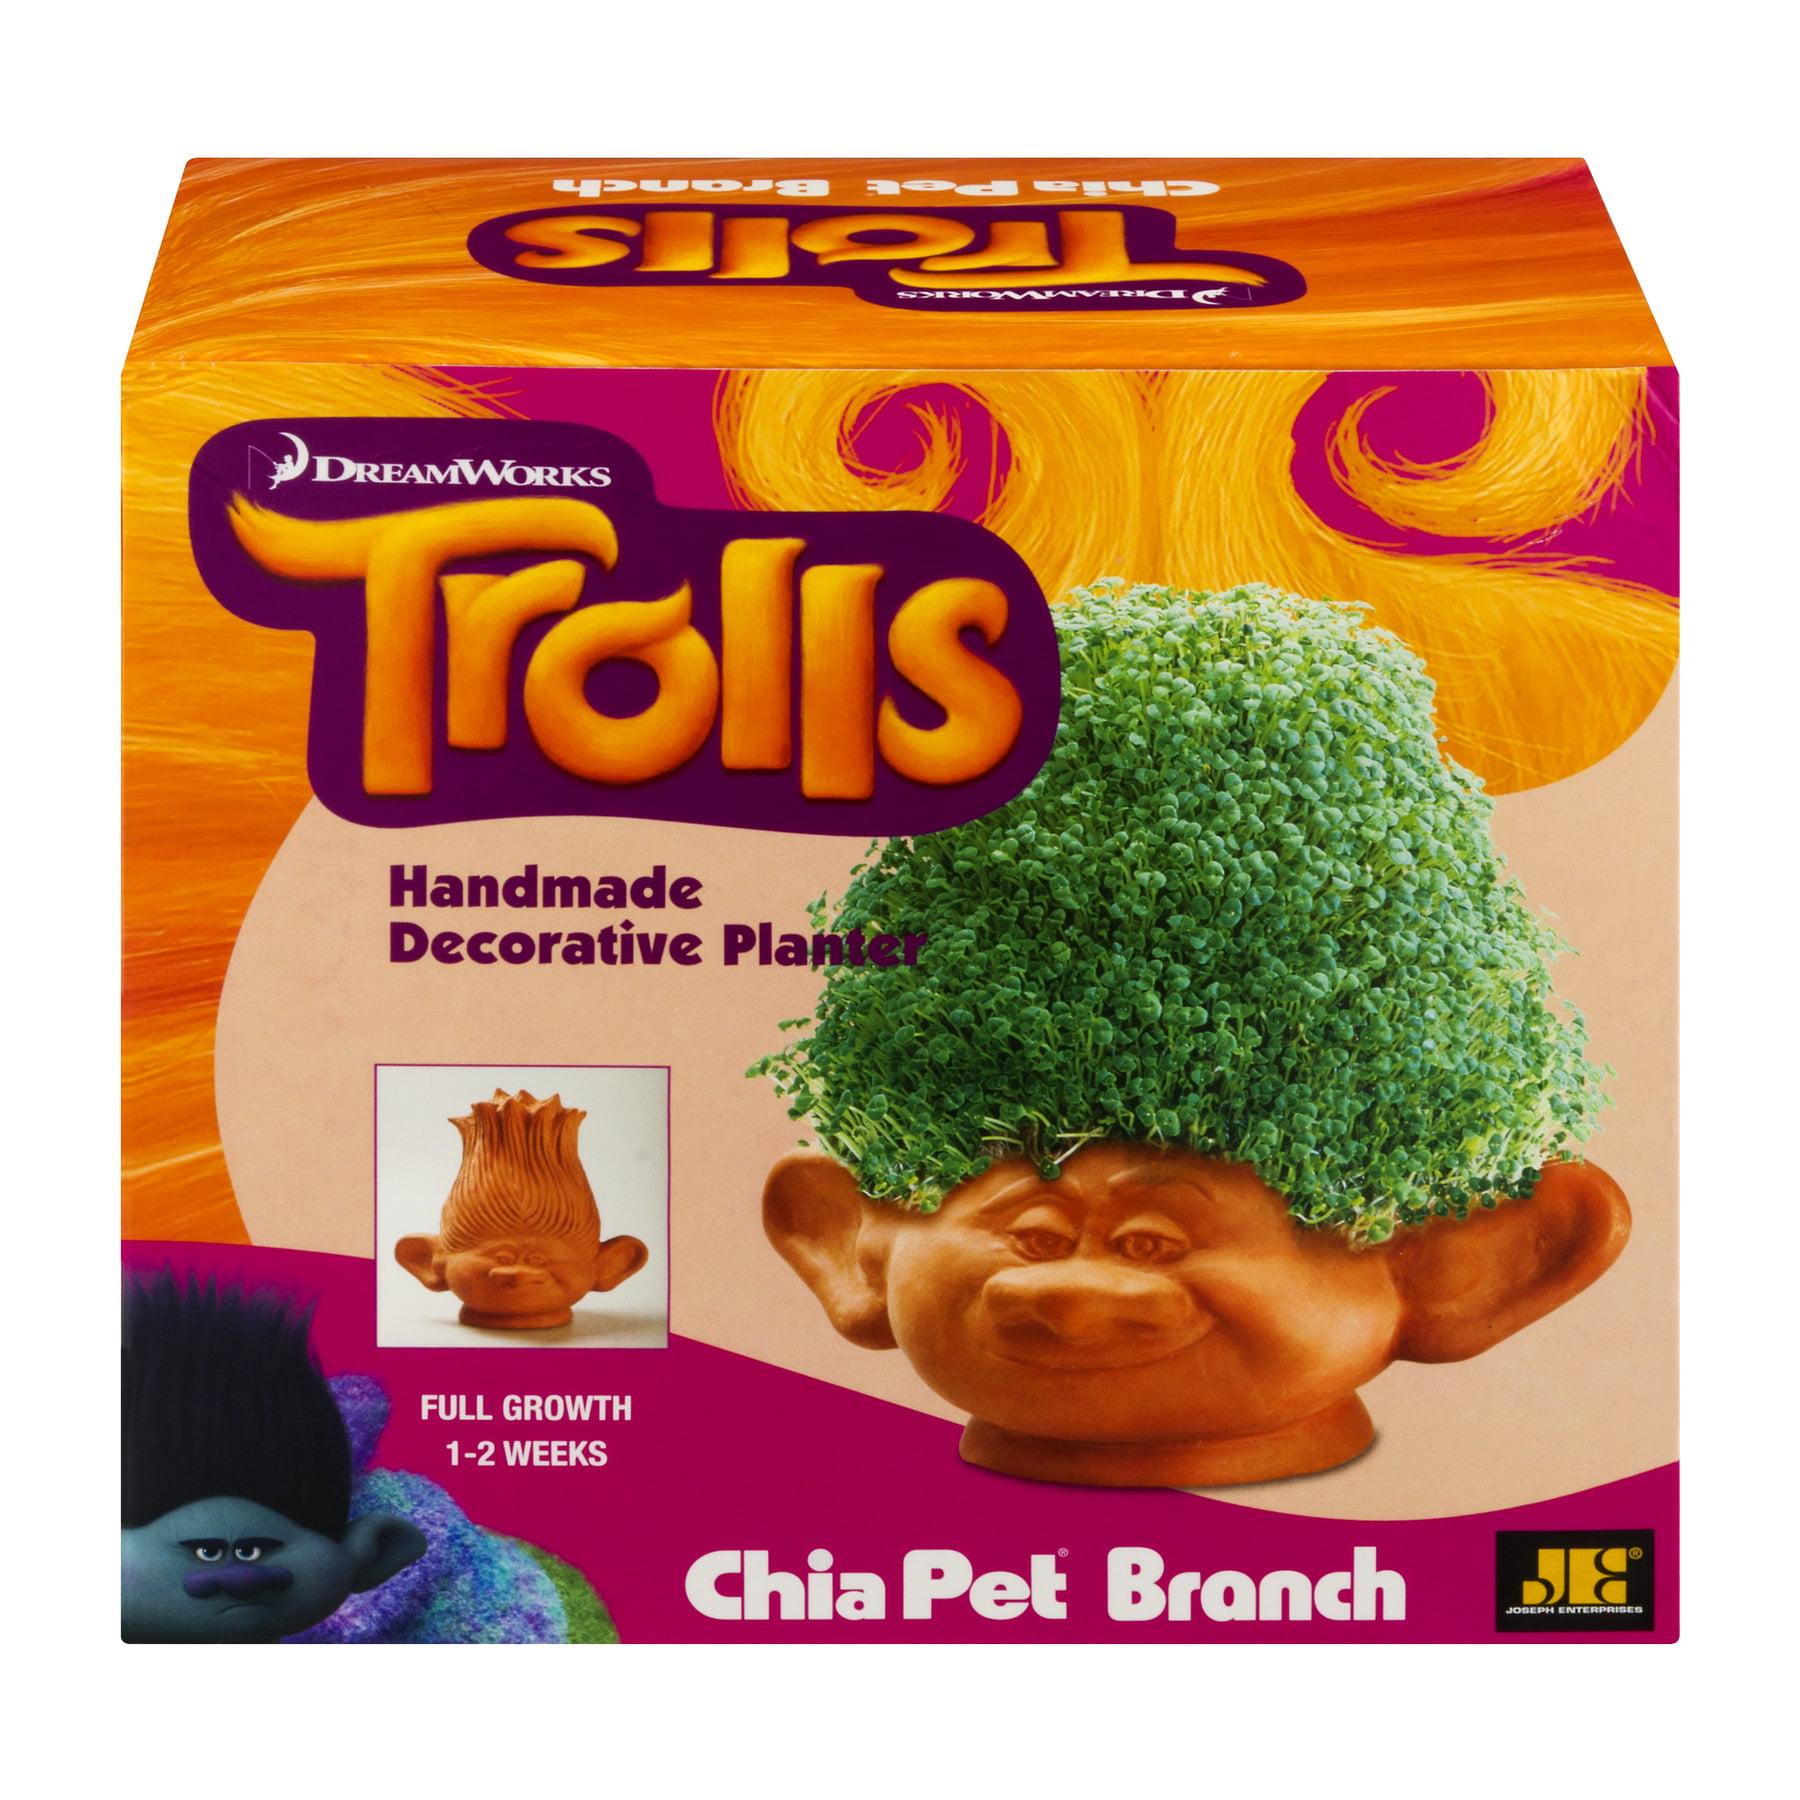 As Seen on TV - Chia Pet Branch DreamWorks Trolls Handmade Decorative Planter